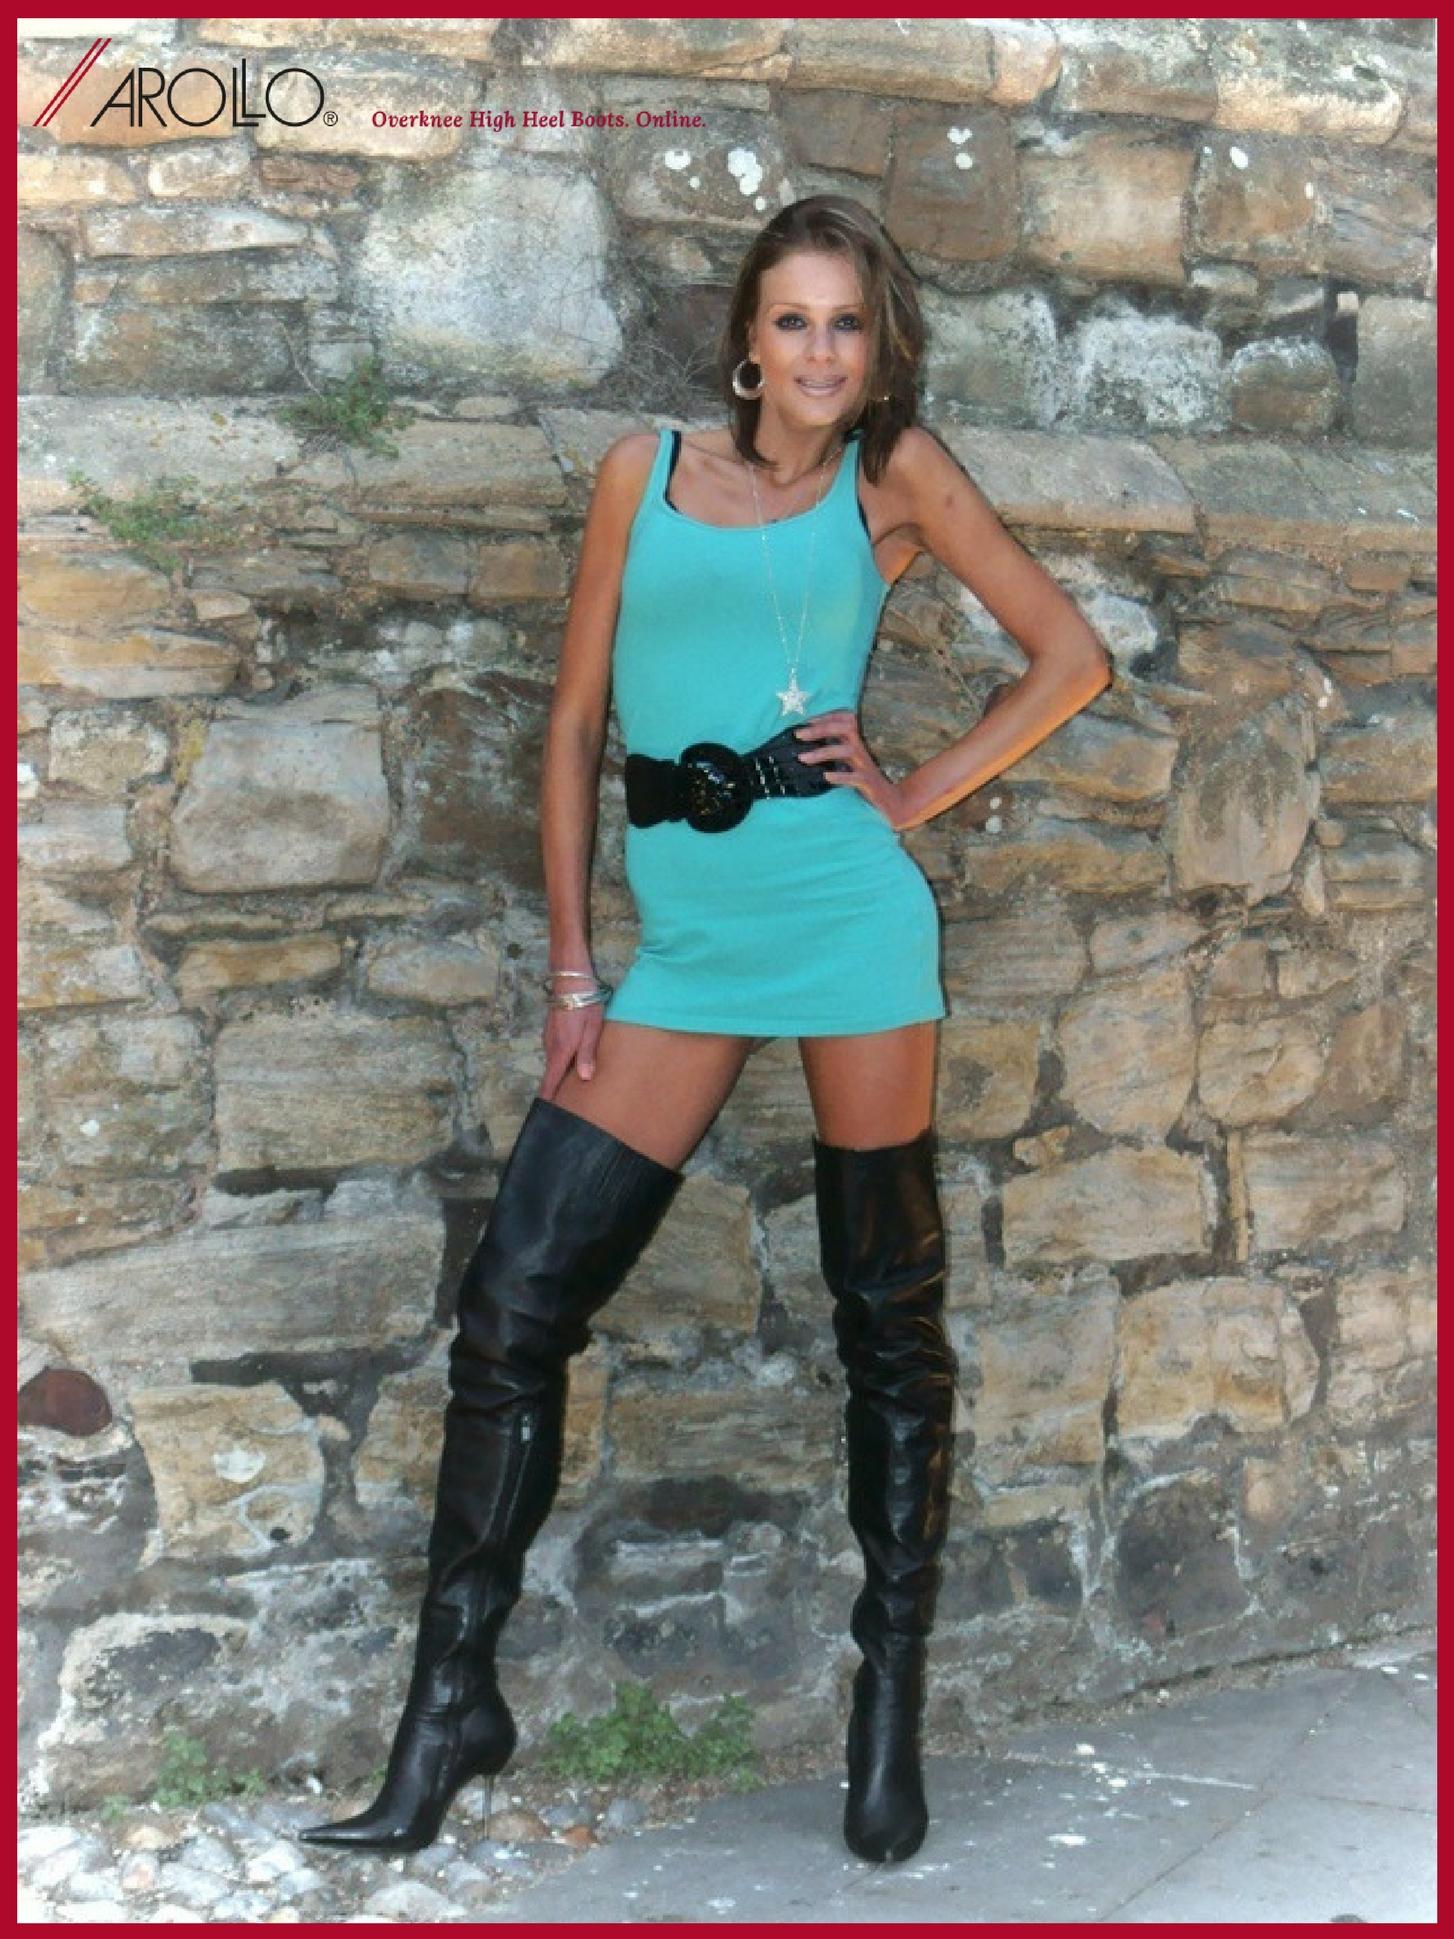 AROLLO Thigh High Boots Stiletto Roma